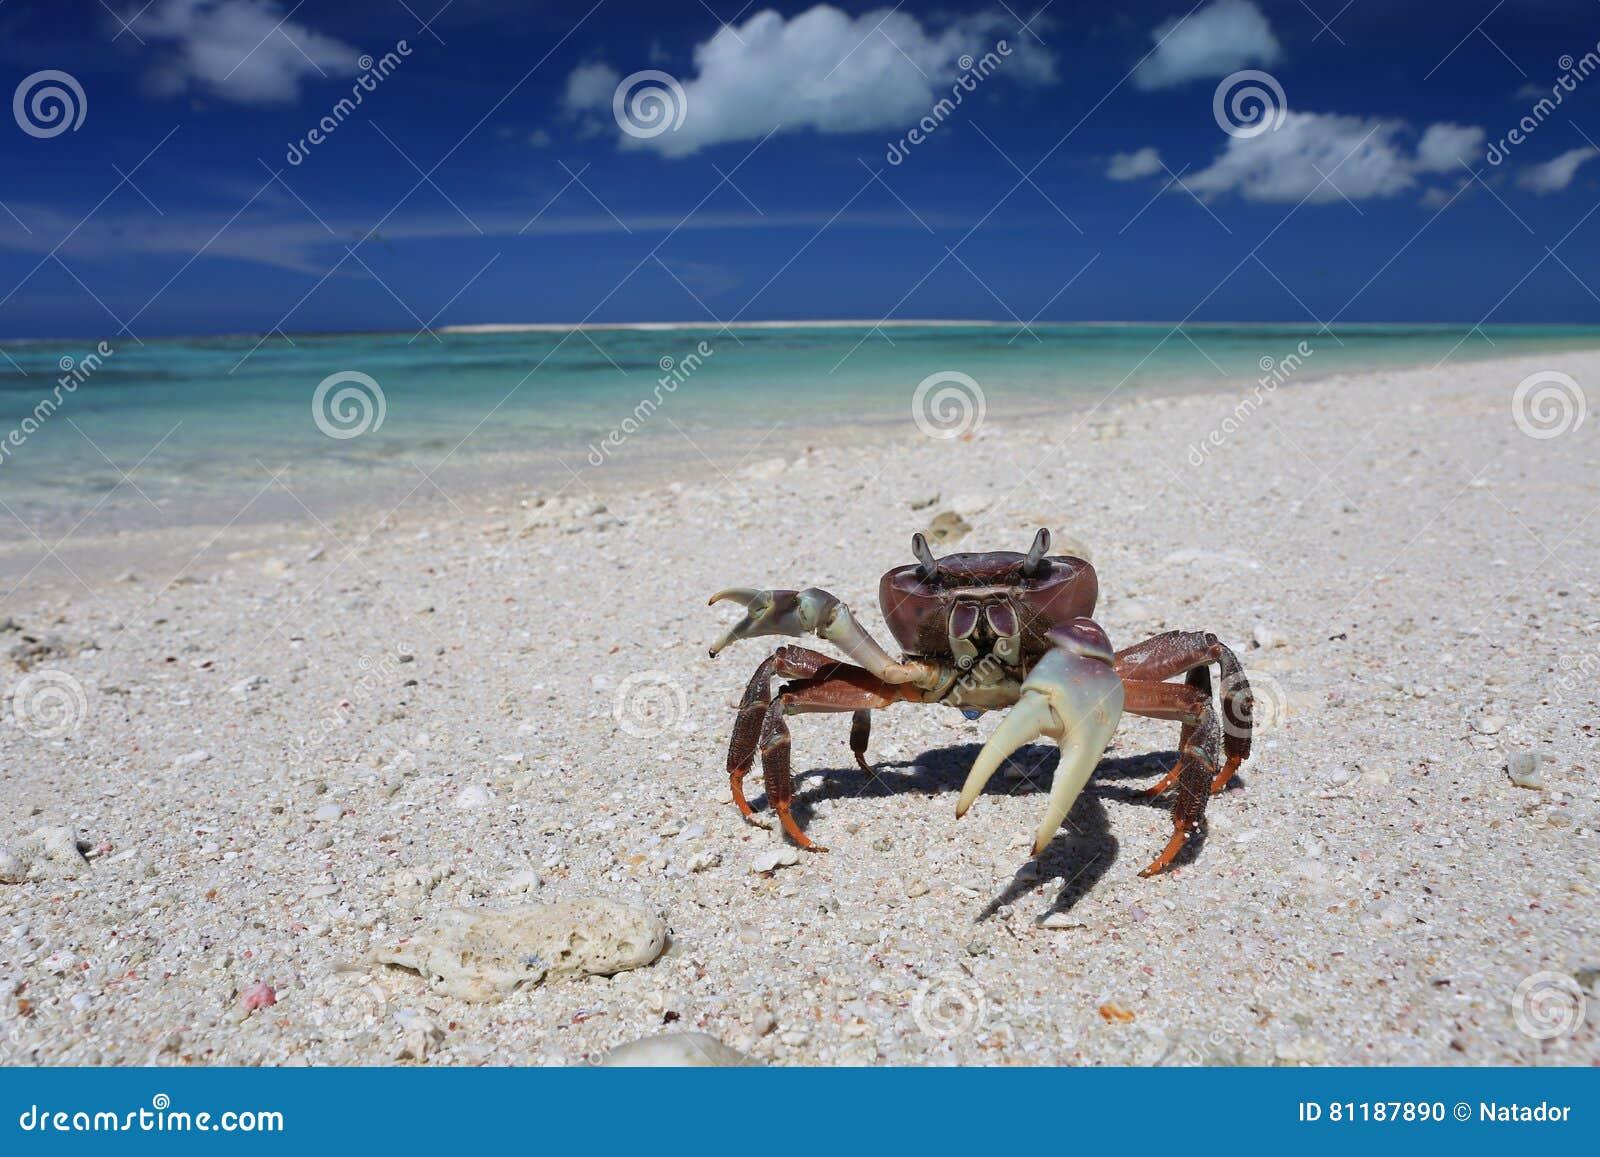 Crab On A Beach, Christmas Island, Kiribati Stock Photo - Image of ...